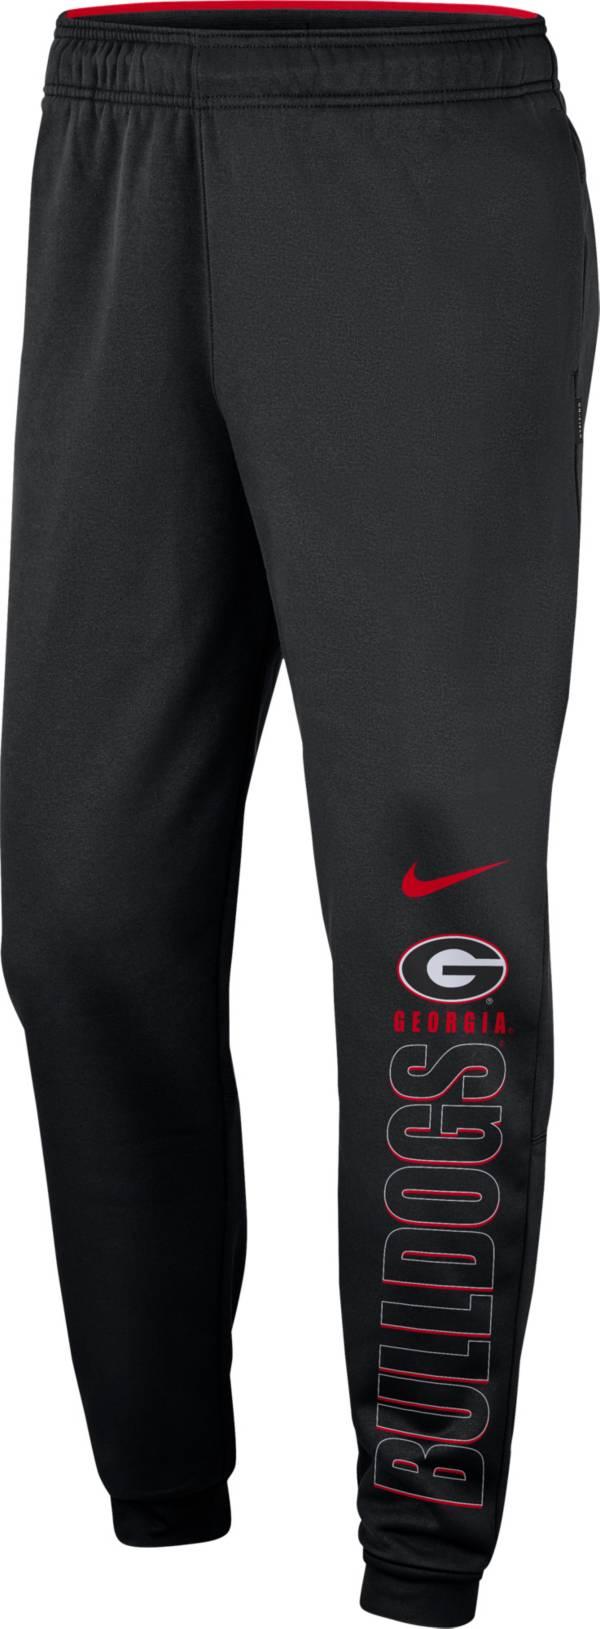 Nike Men's Georgia Bulldogs Therma Tapered Black Pants product image